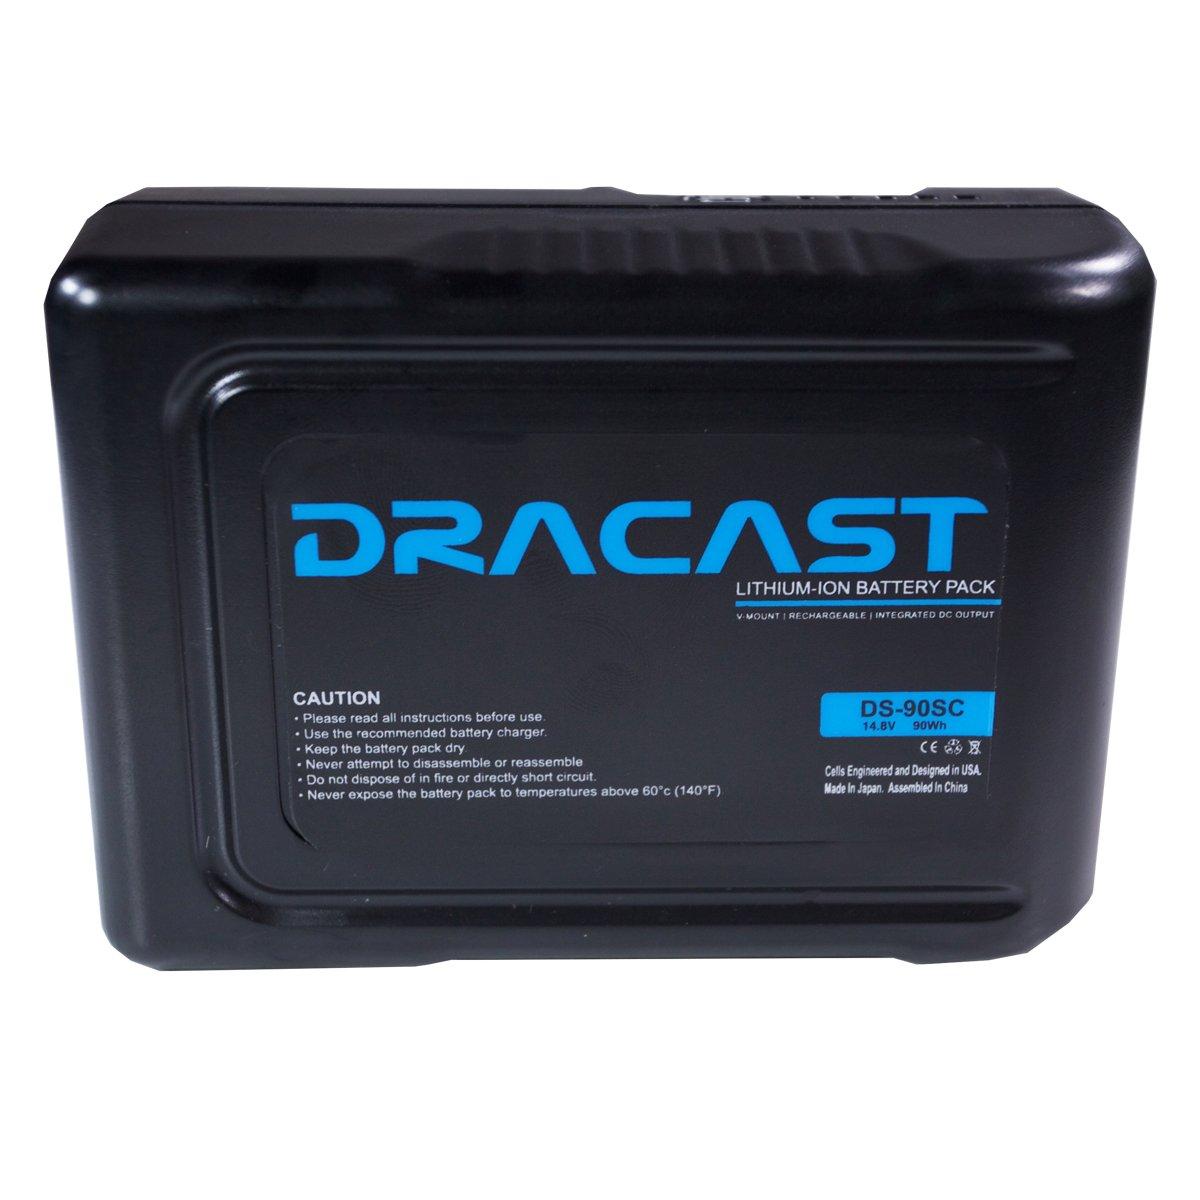 Dracast 90Wh 14.8V Compact Li-Ion V-Mount Battery, Black (BA-90SC)